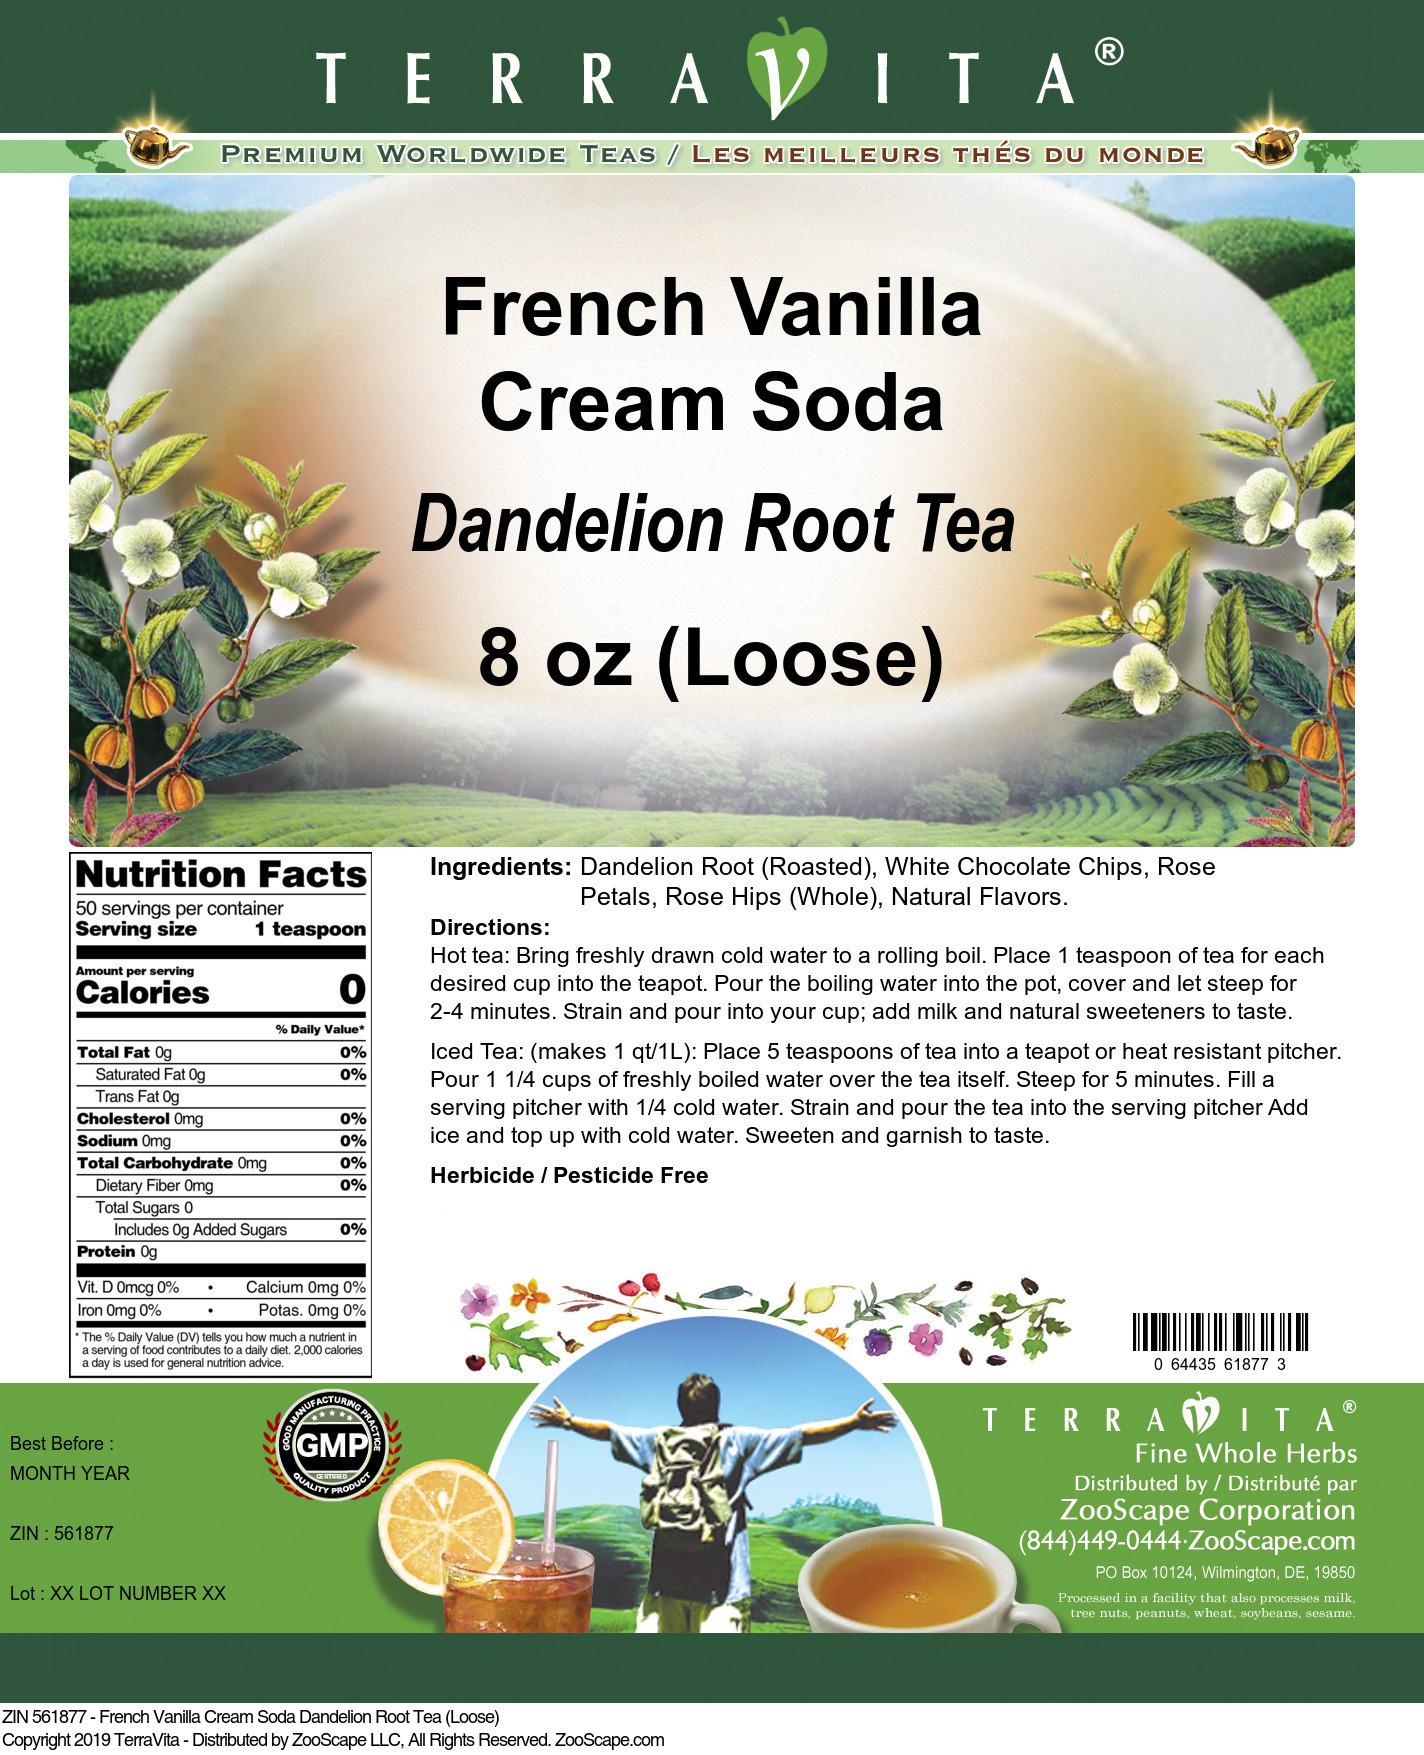 French Vanilla Cream Soda Dandelion Root